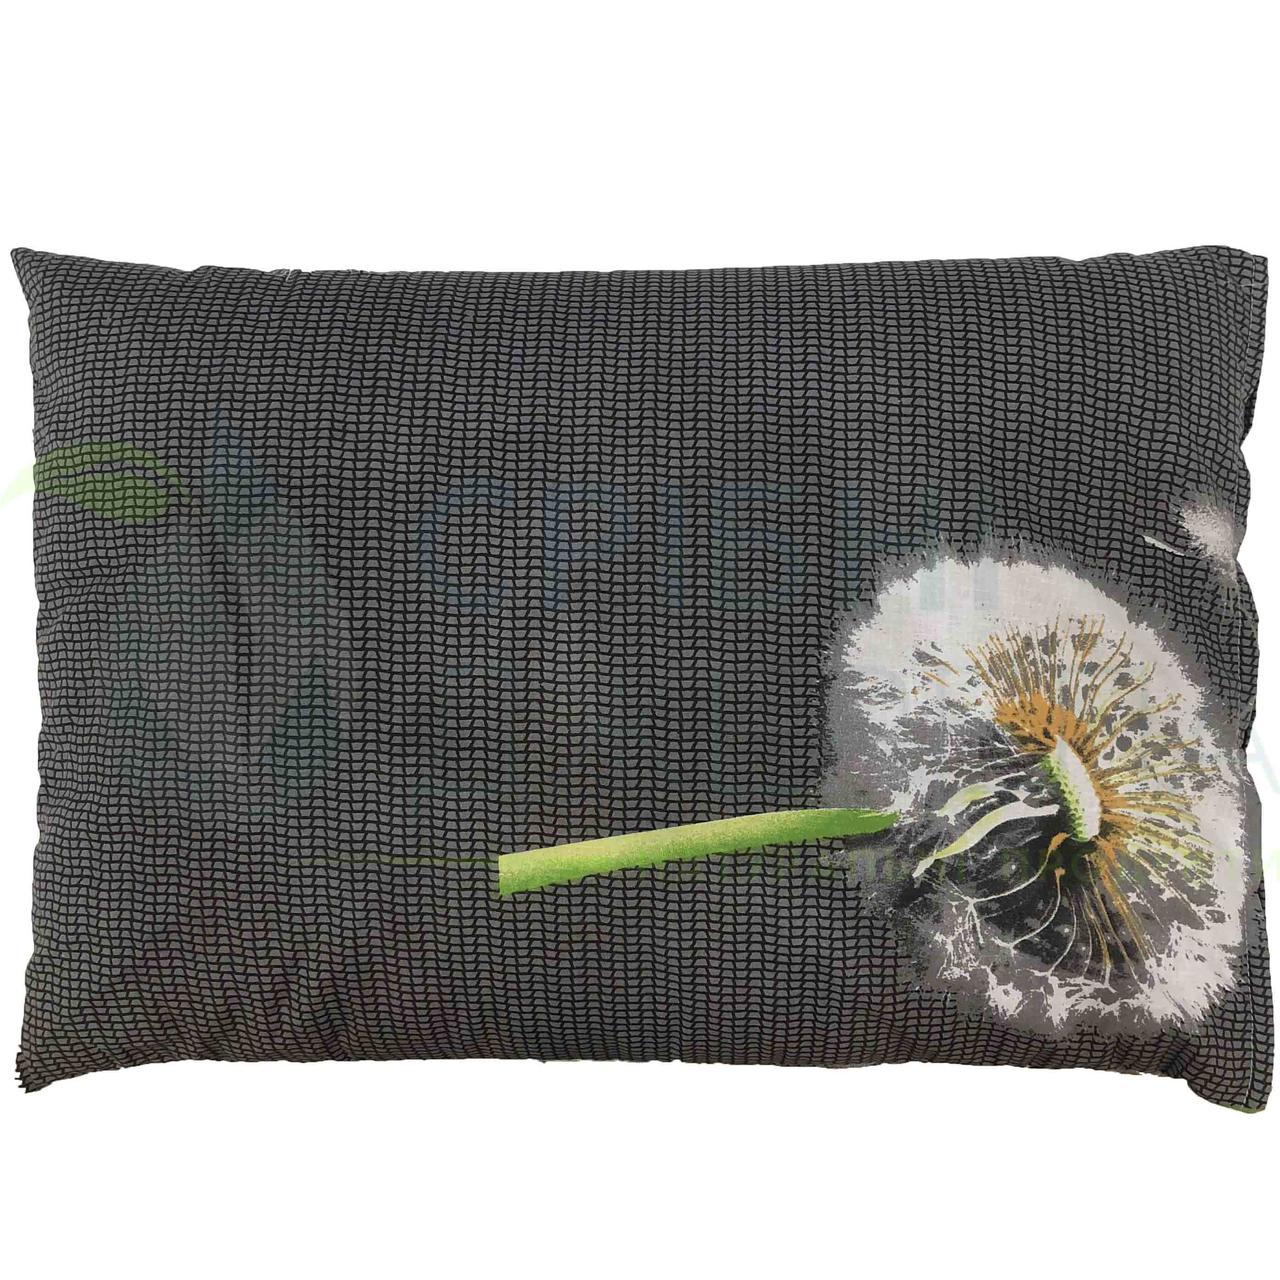 Подушка з гречаної лузги 40*60 см